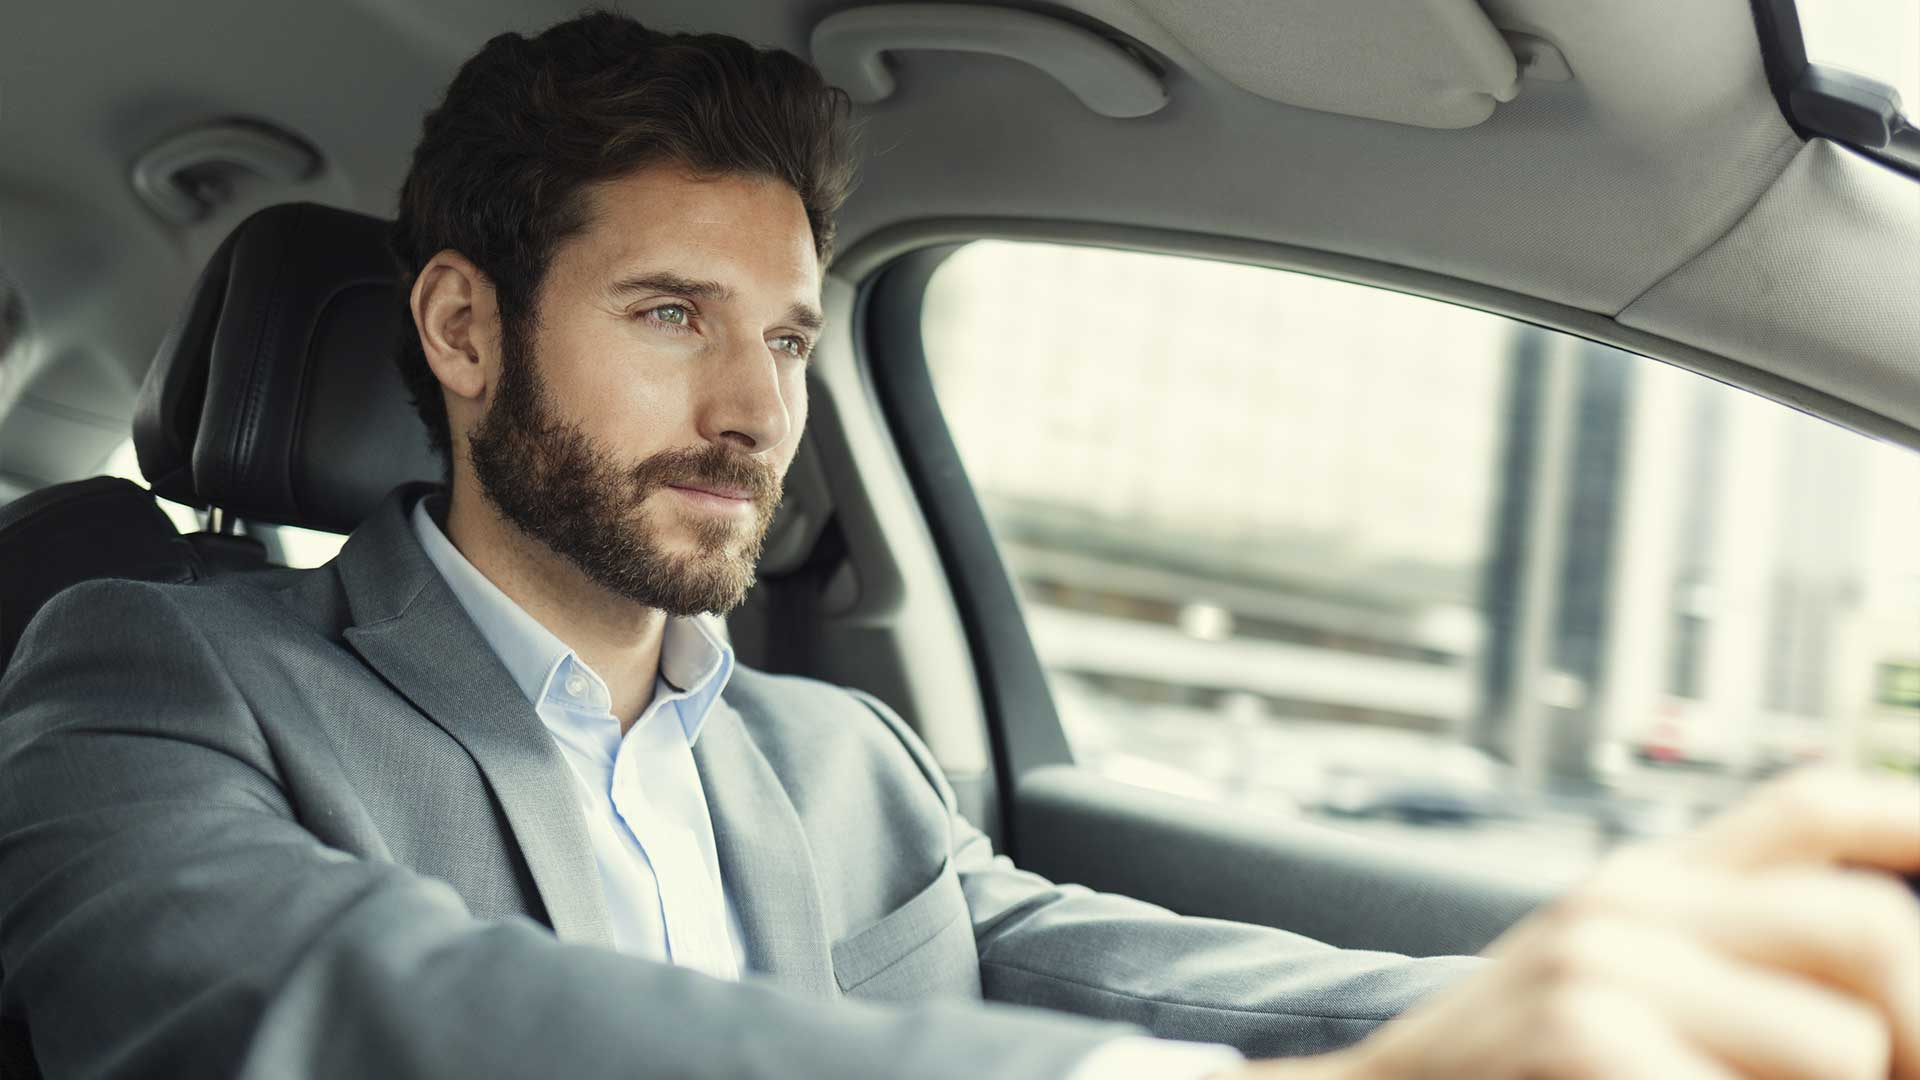 best mileage reimbursement platform for mobile employees